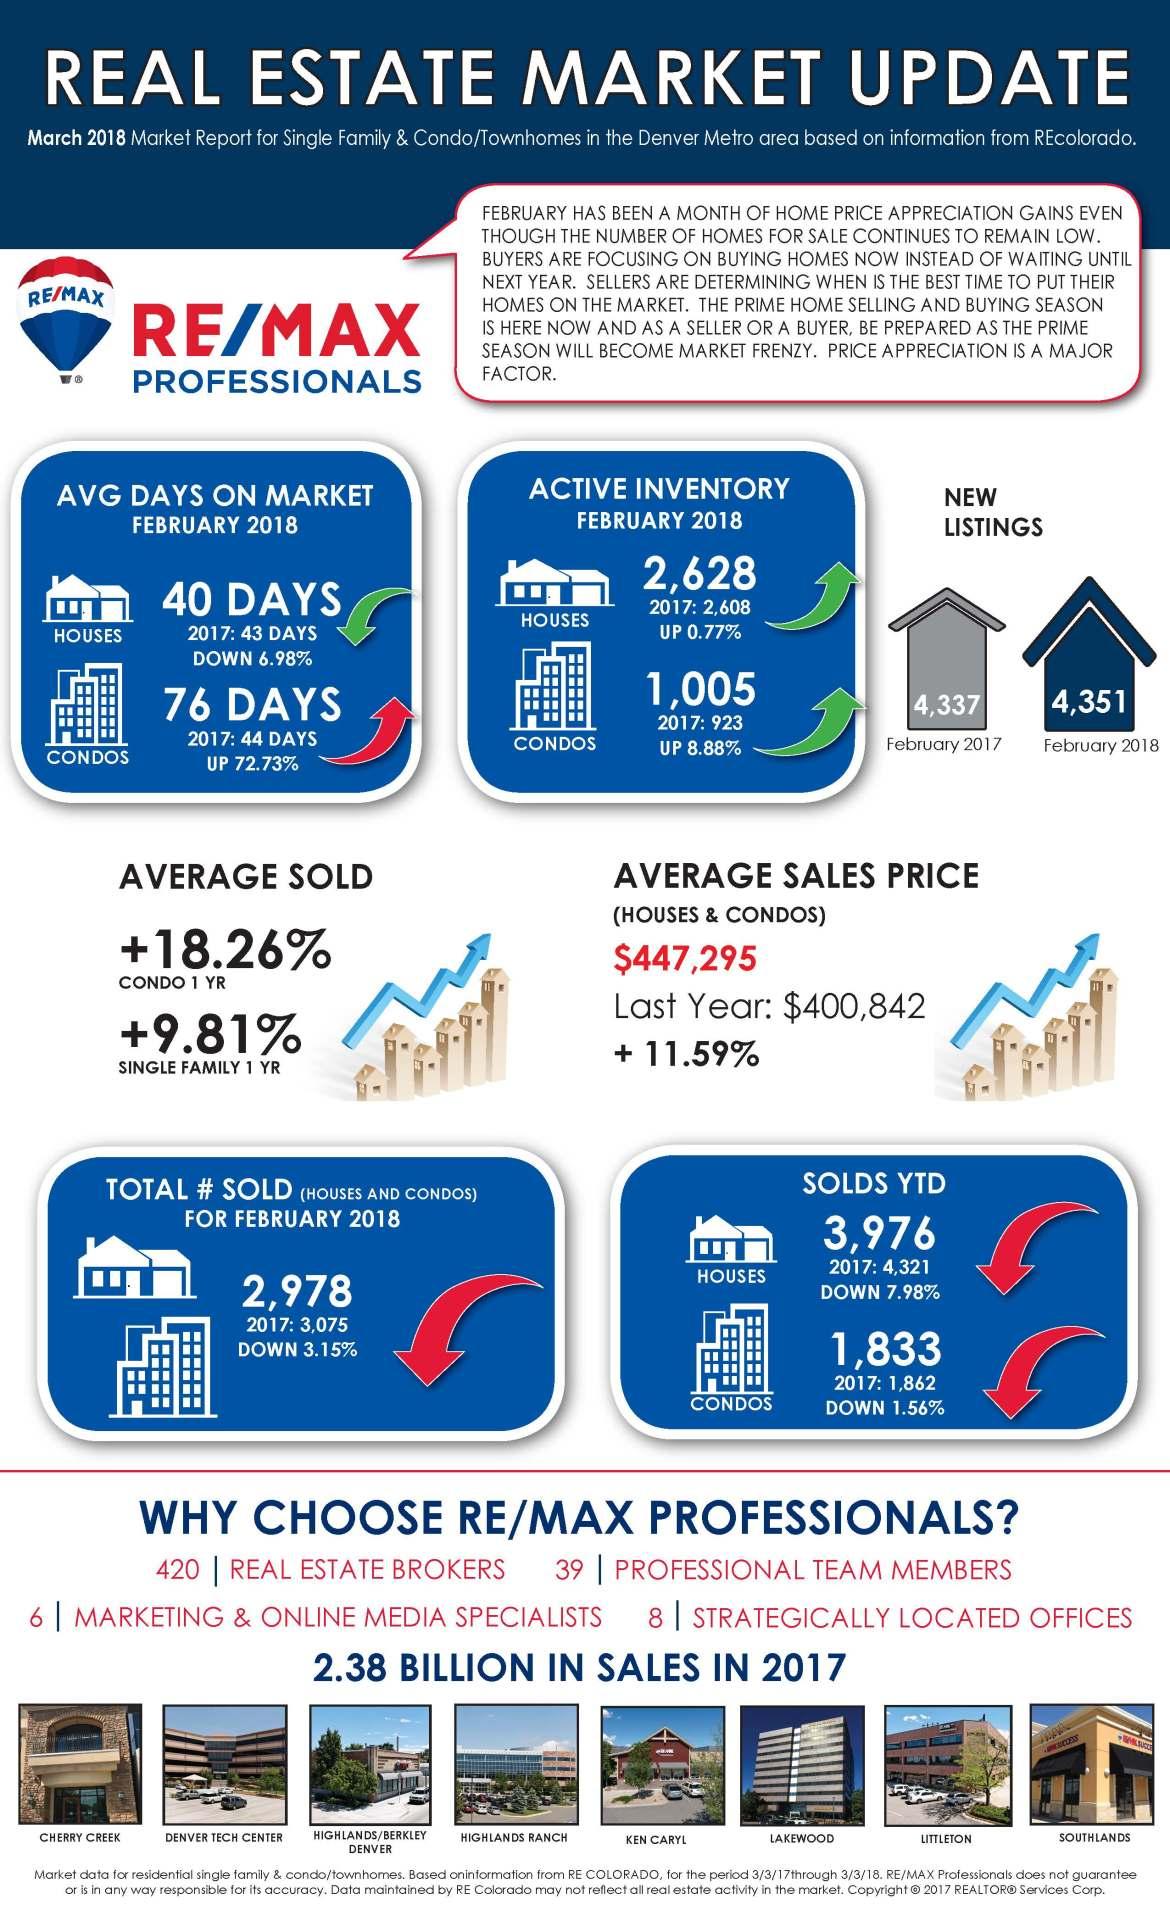 Real Estate Market Update - March 2018